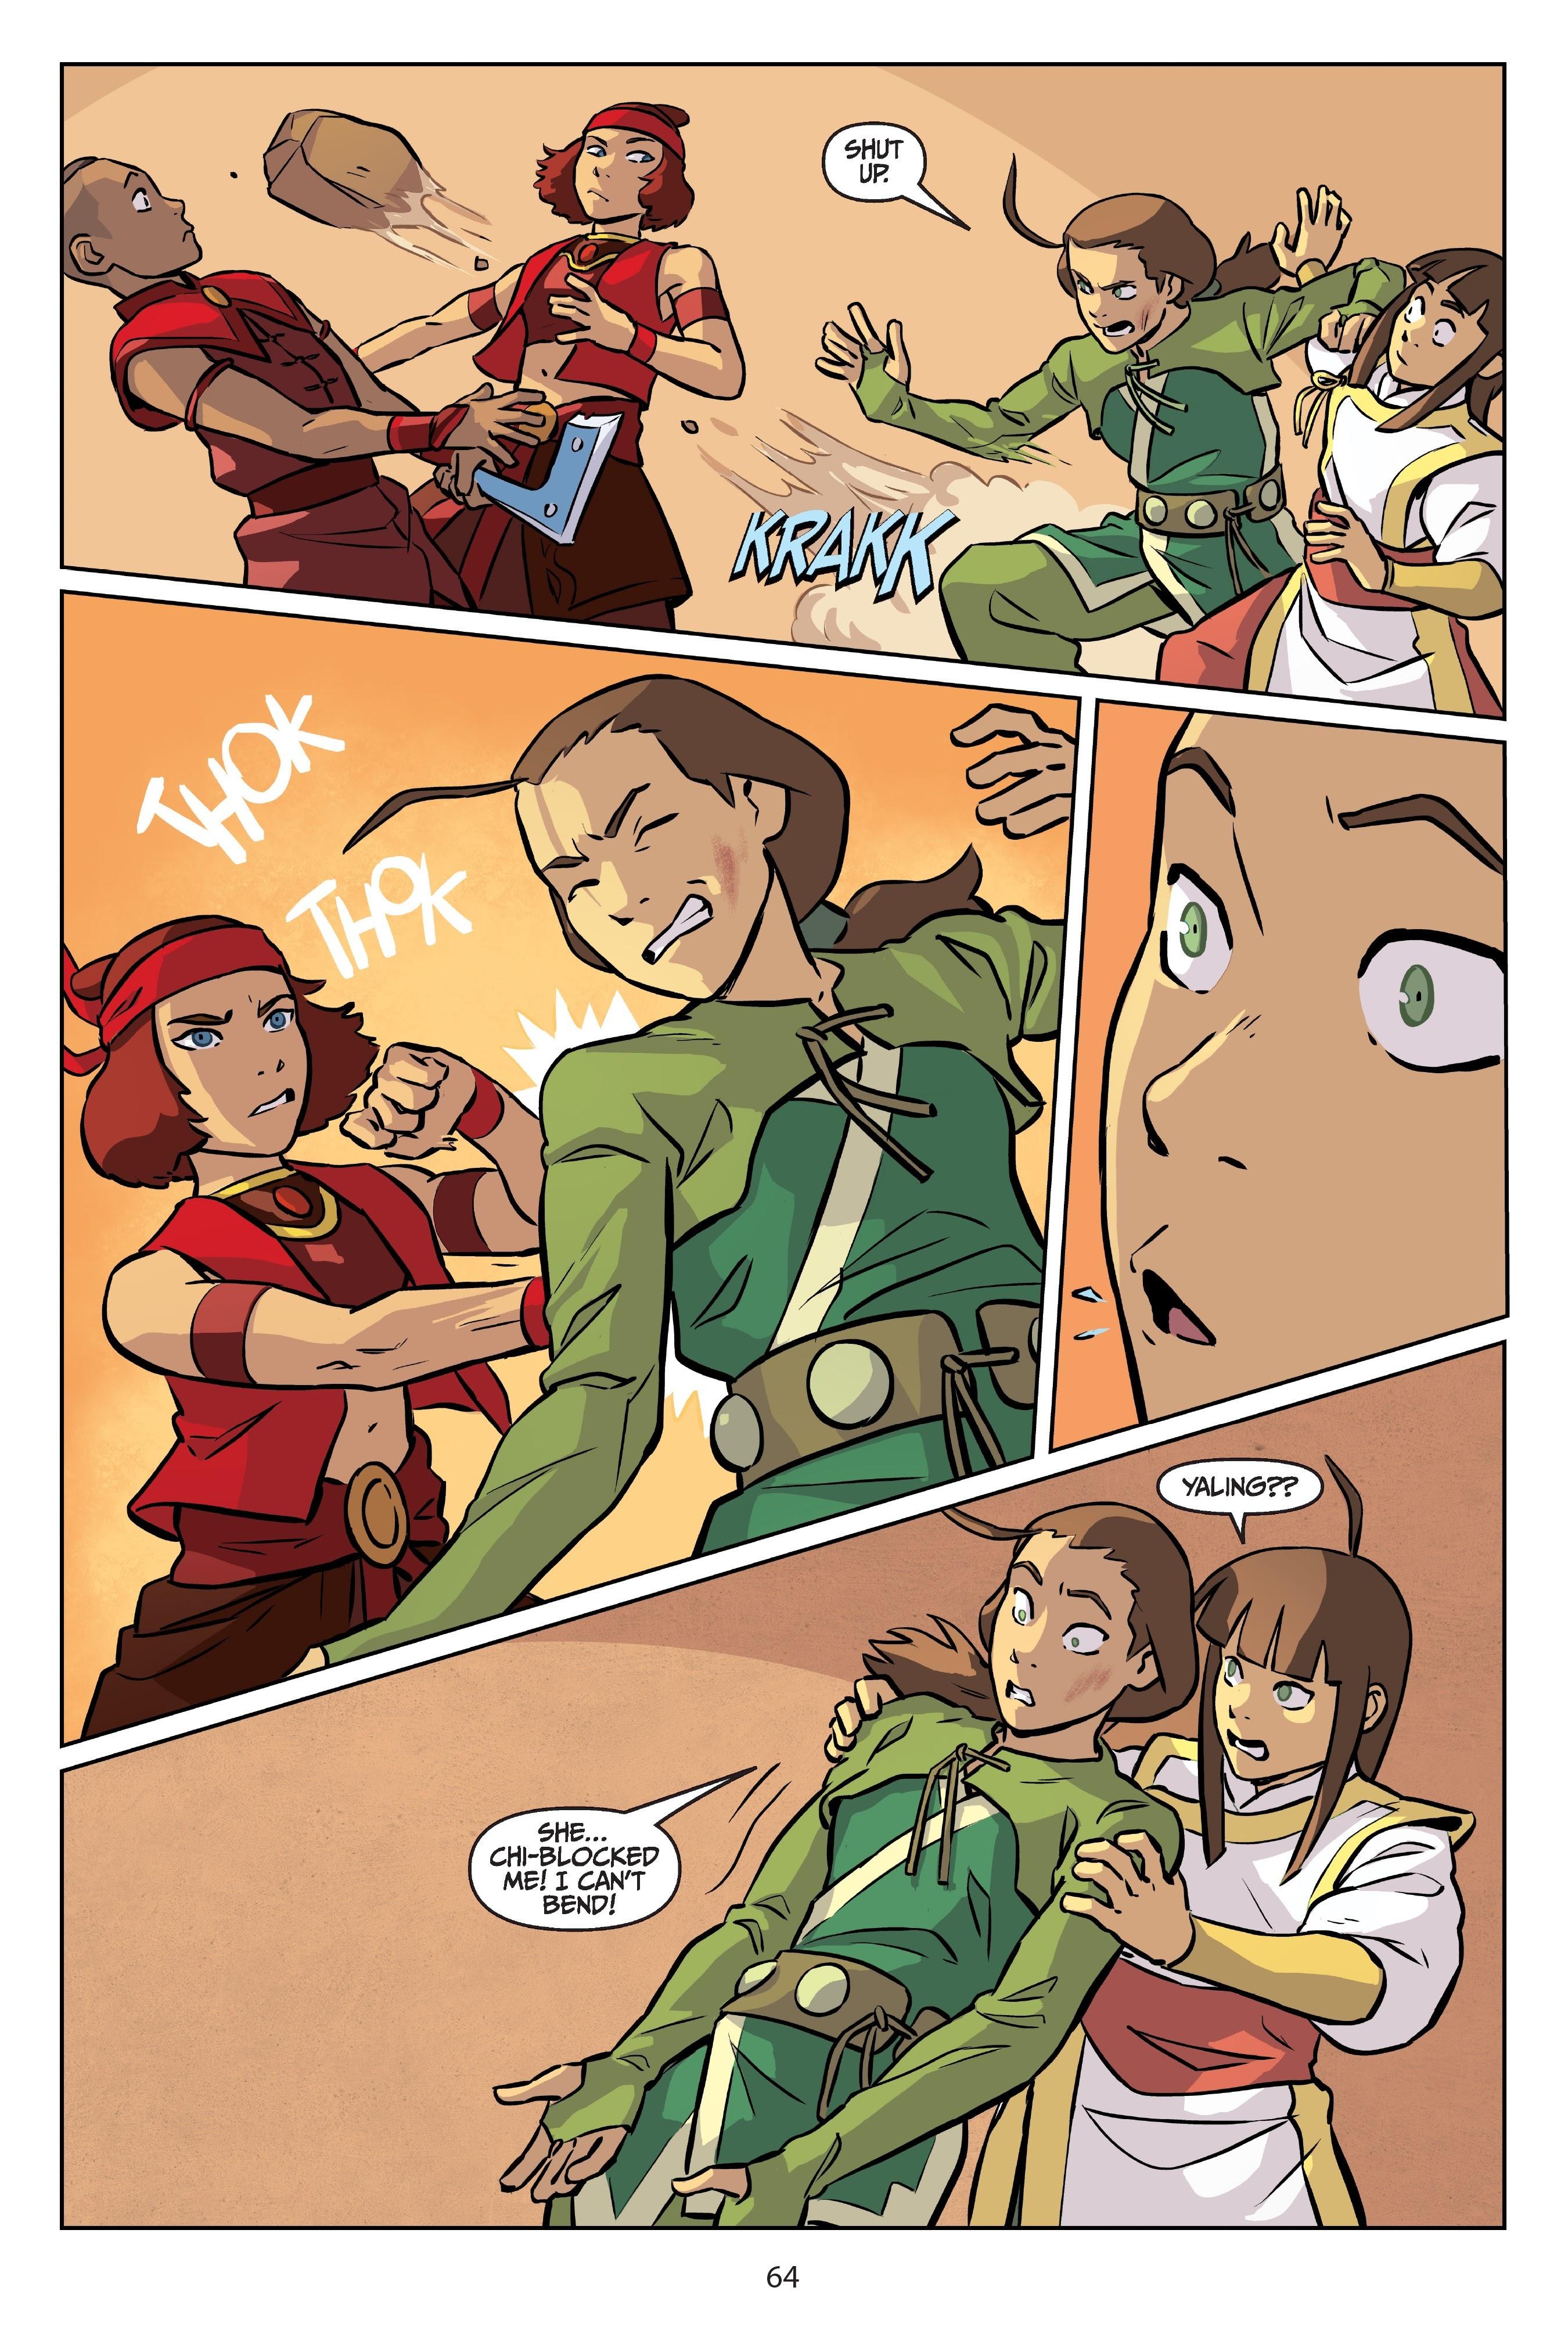 Nickelodeon Avatar: The Last Airbender - Imbalance TPB_2 Page 64